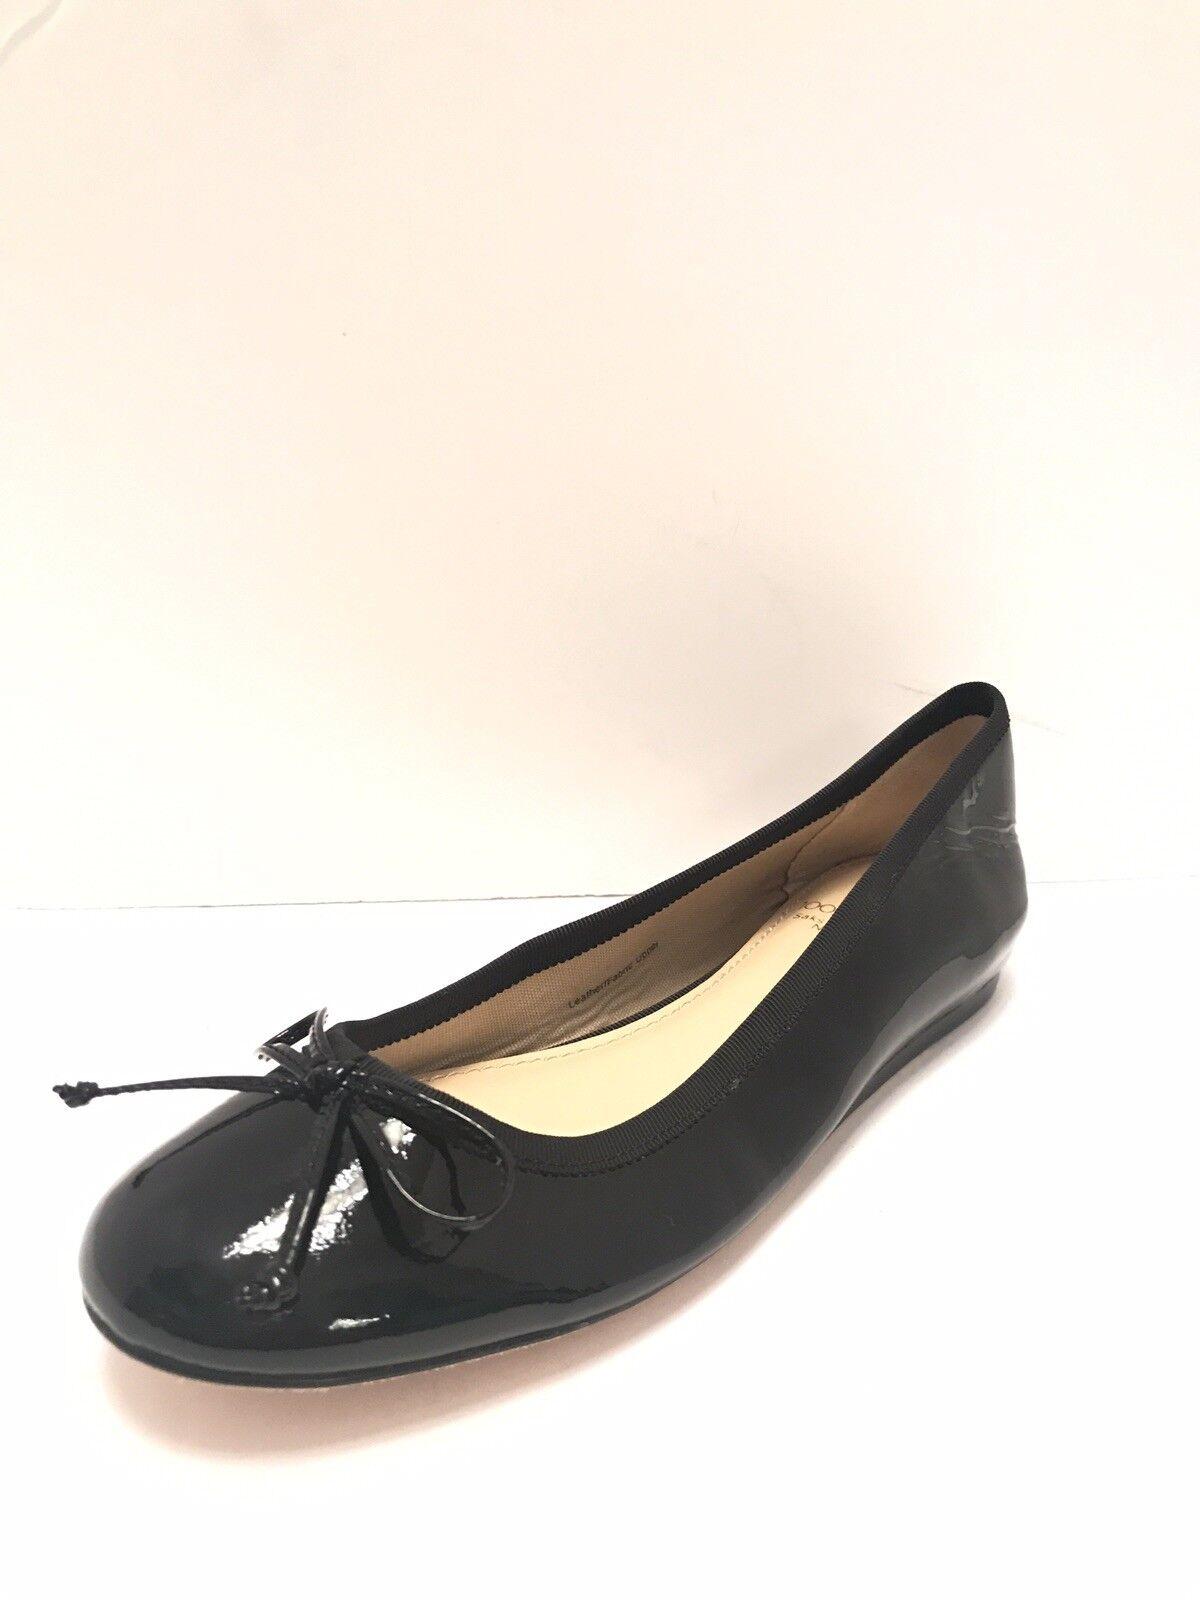 Retail  195 10022-schuhe Saks Fifth Avenue Patent Leather Bow Ballet Flats Sz 5